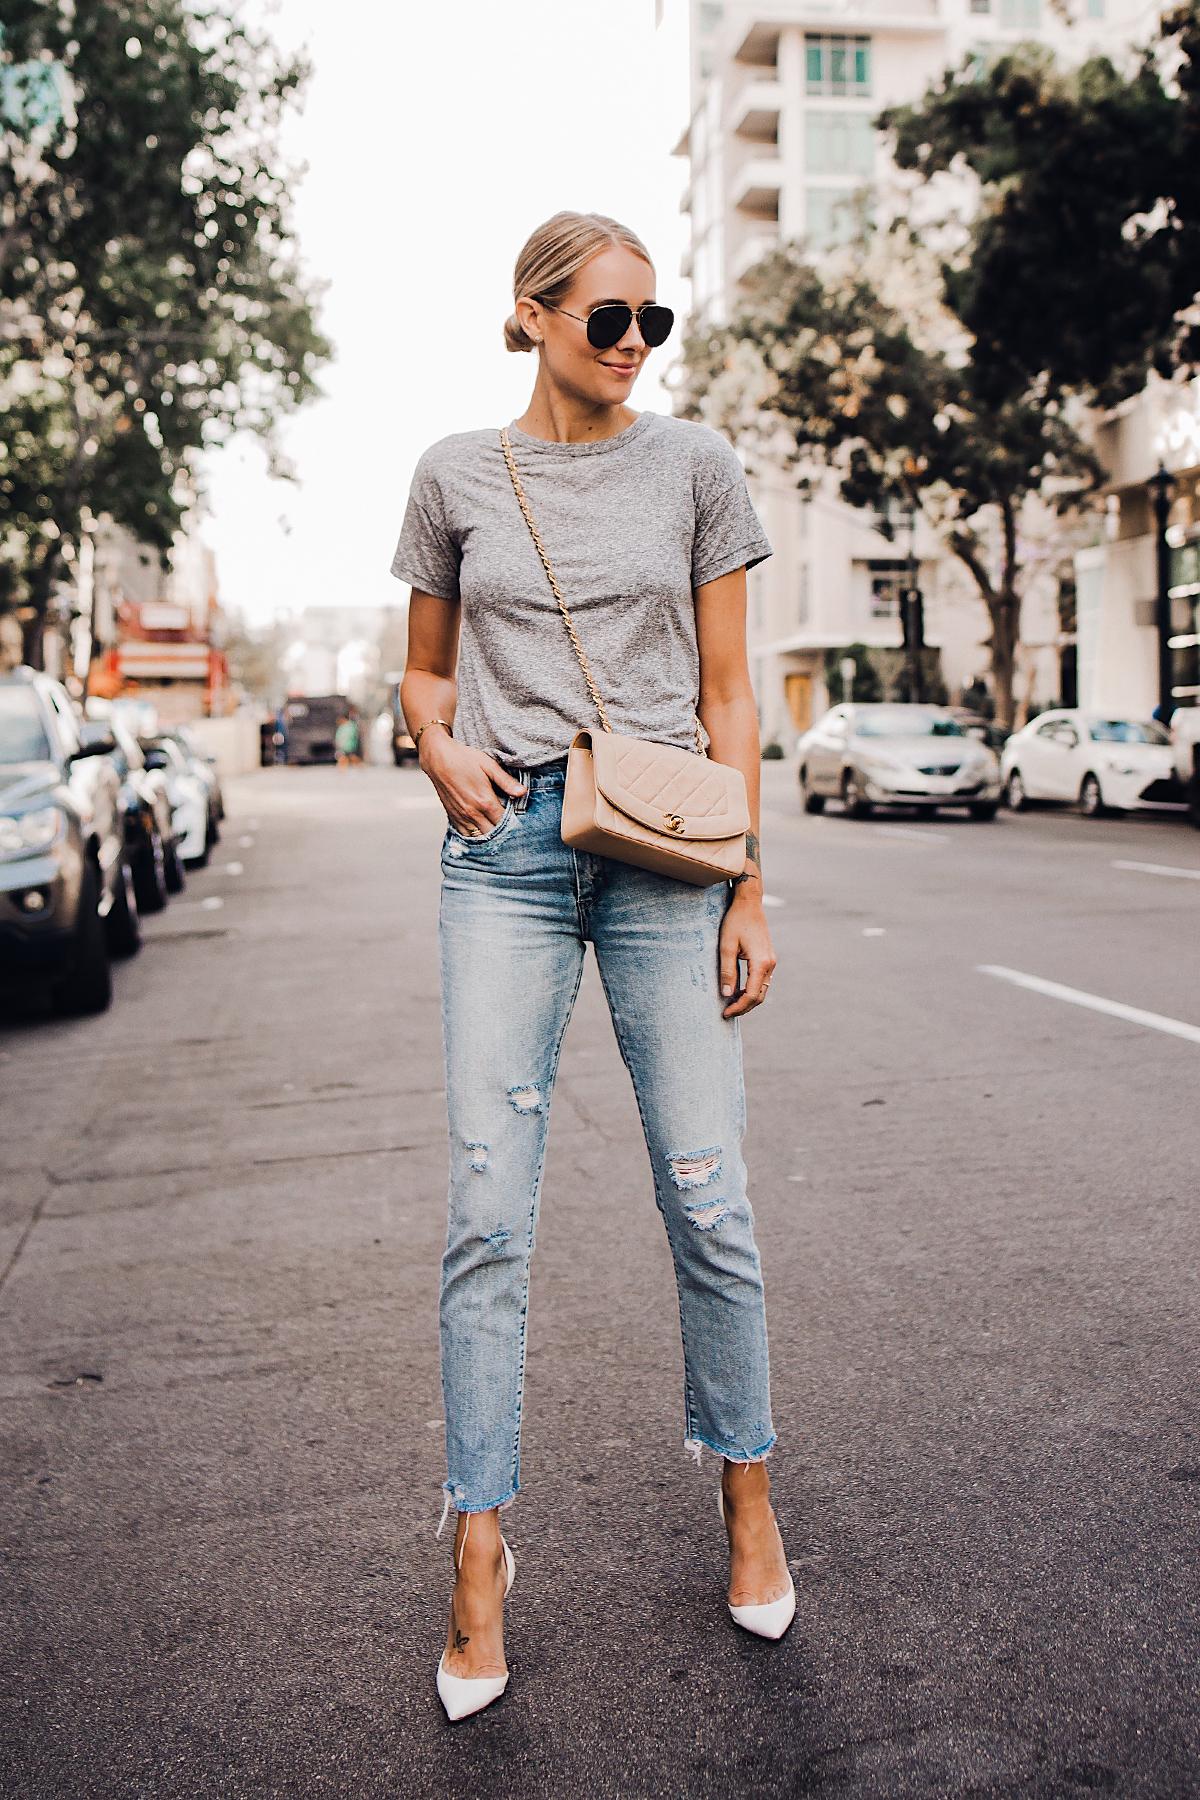 Blonde Woman Wearing Topshop Grey Tshirt Blanknyc Ripped Jeans Christian Louboutin White Pumps Chanel Quilted Tan Handbag Celine Aviator Sunglasses Fashion Jackson San Diego Blogger Fashion Blogger Street Style